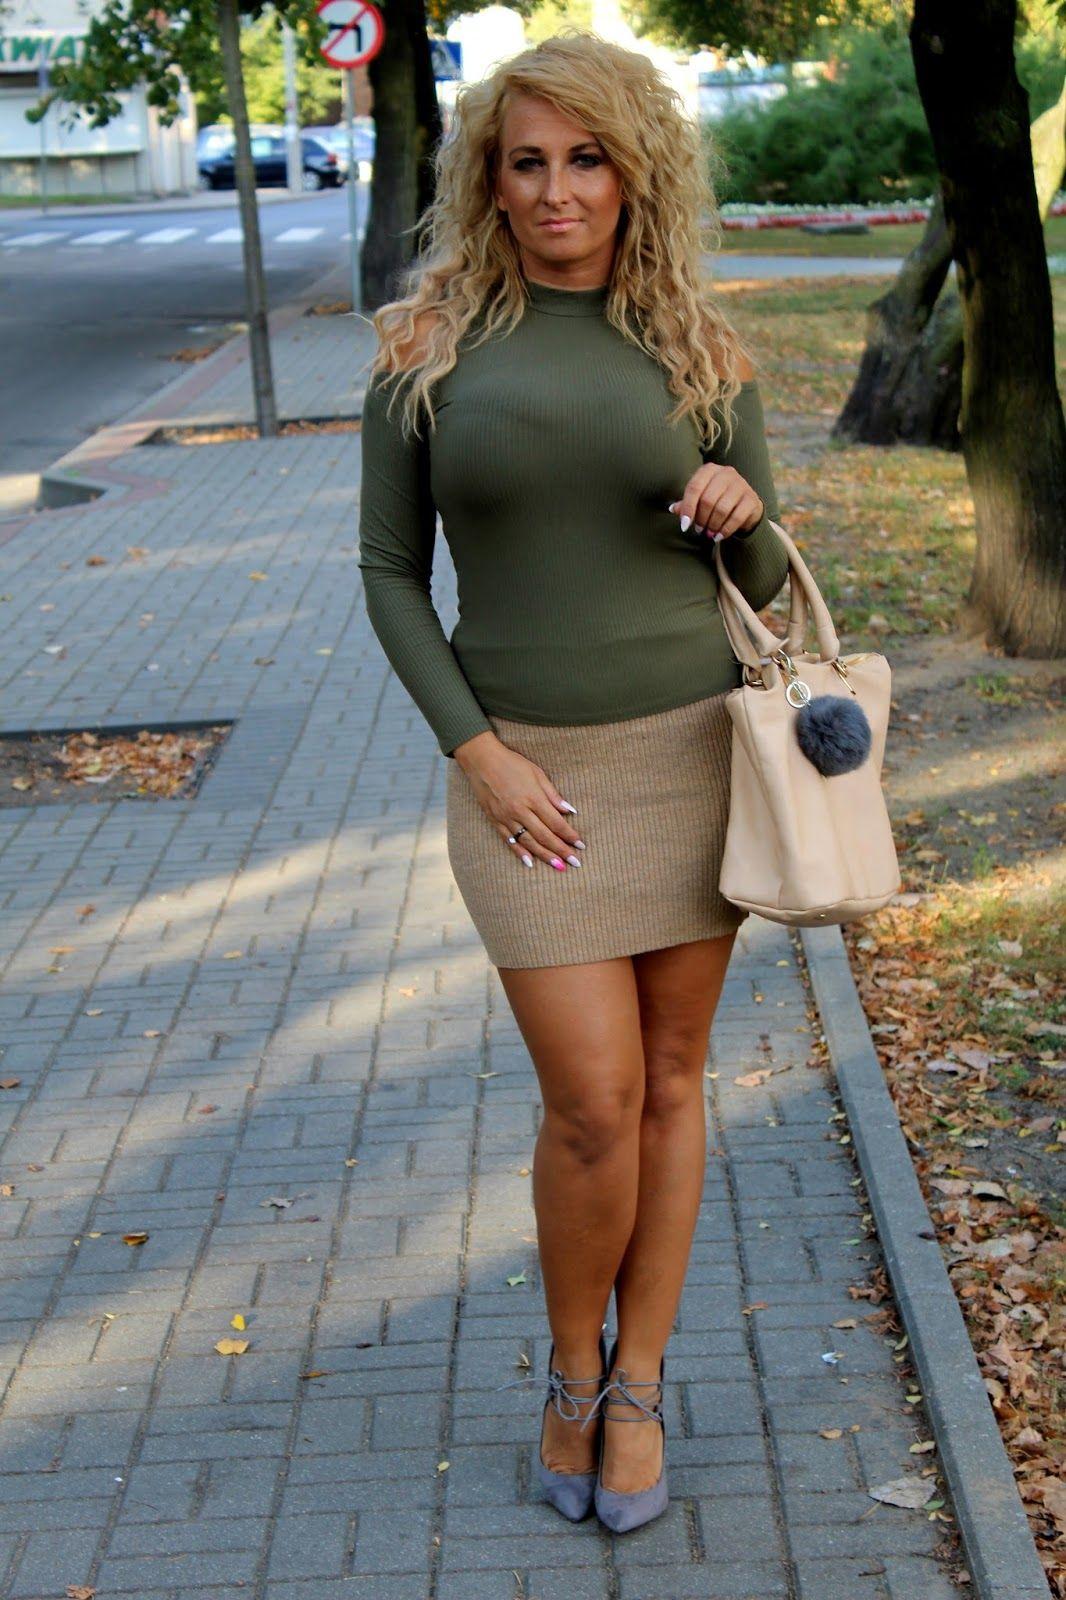 Pin by Bomber64 on Frauen, gut gekleidet   Pinterest   Curvy